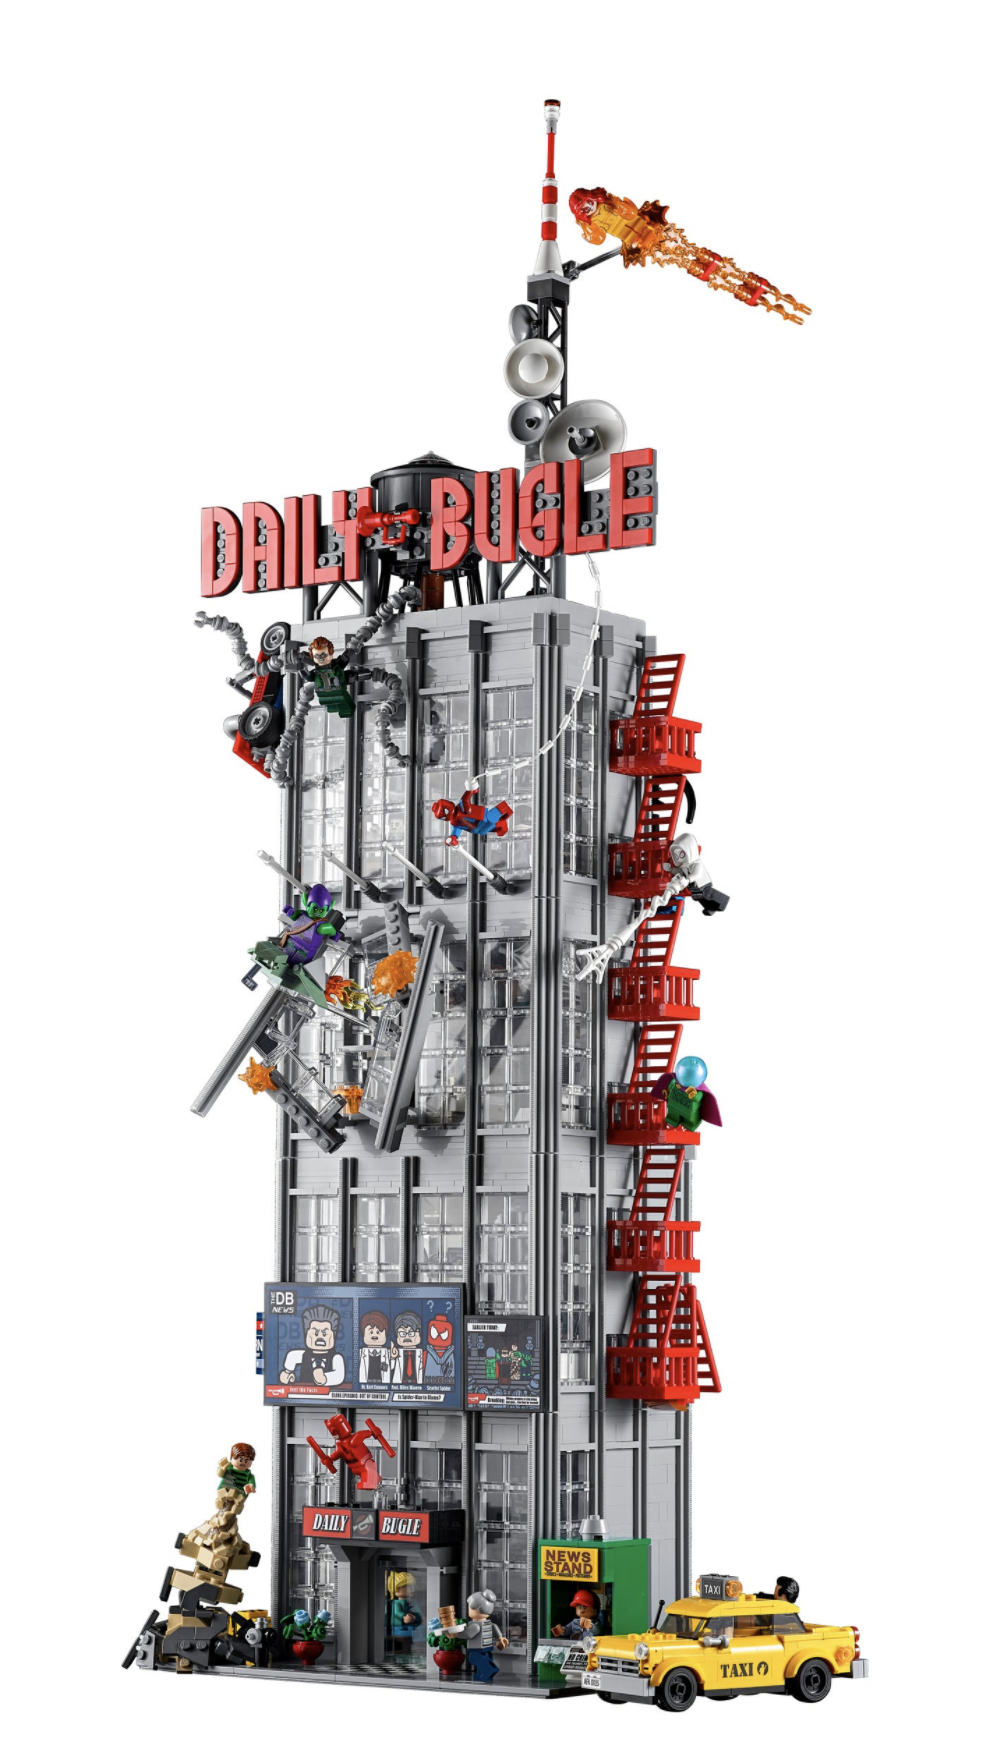 Daily Bugle Minifigures - Header Image